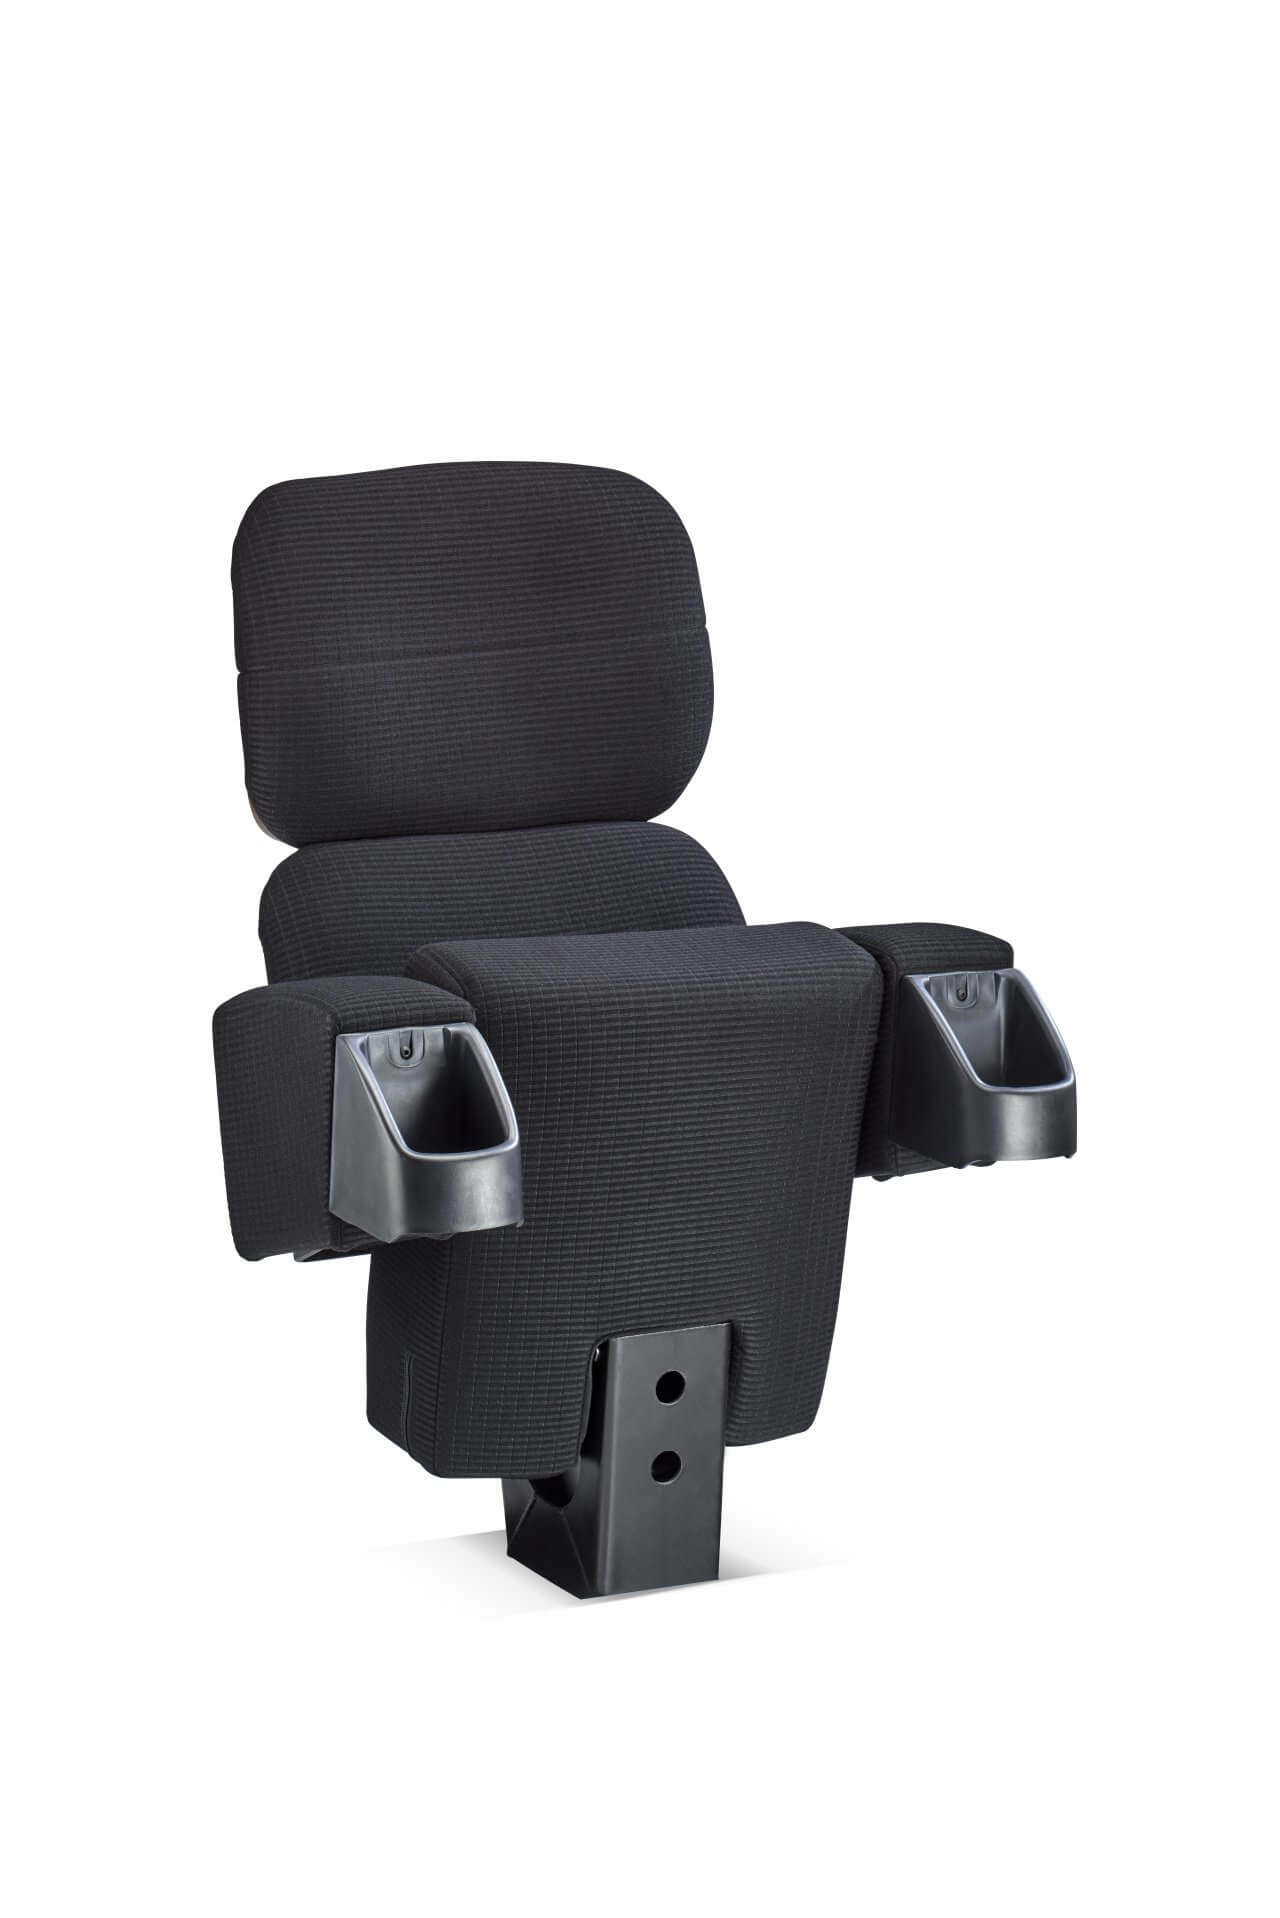 Kleslo -Ottoman Inertie- Leader de fabrication de fauteuils cinéma, théâtre ...UGC